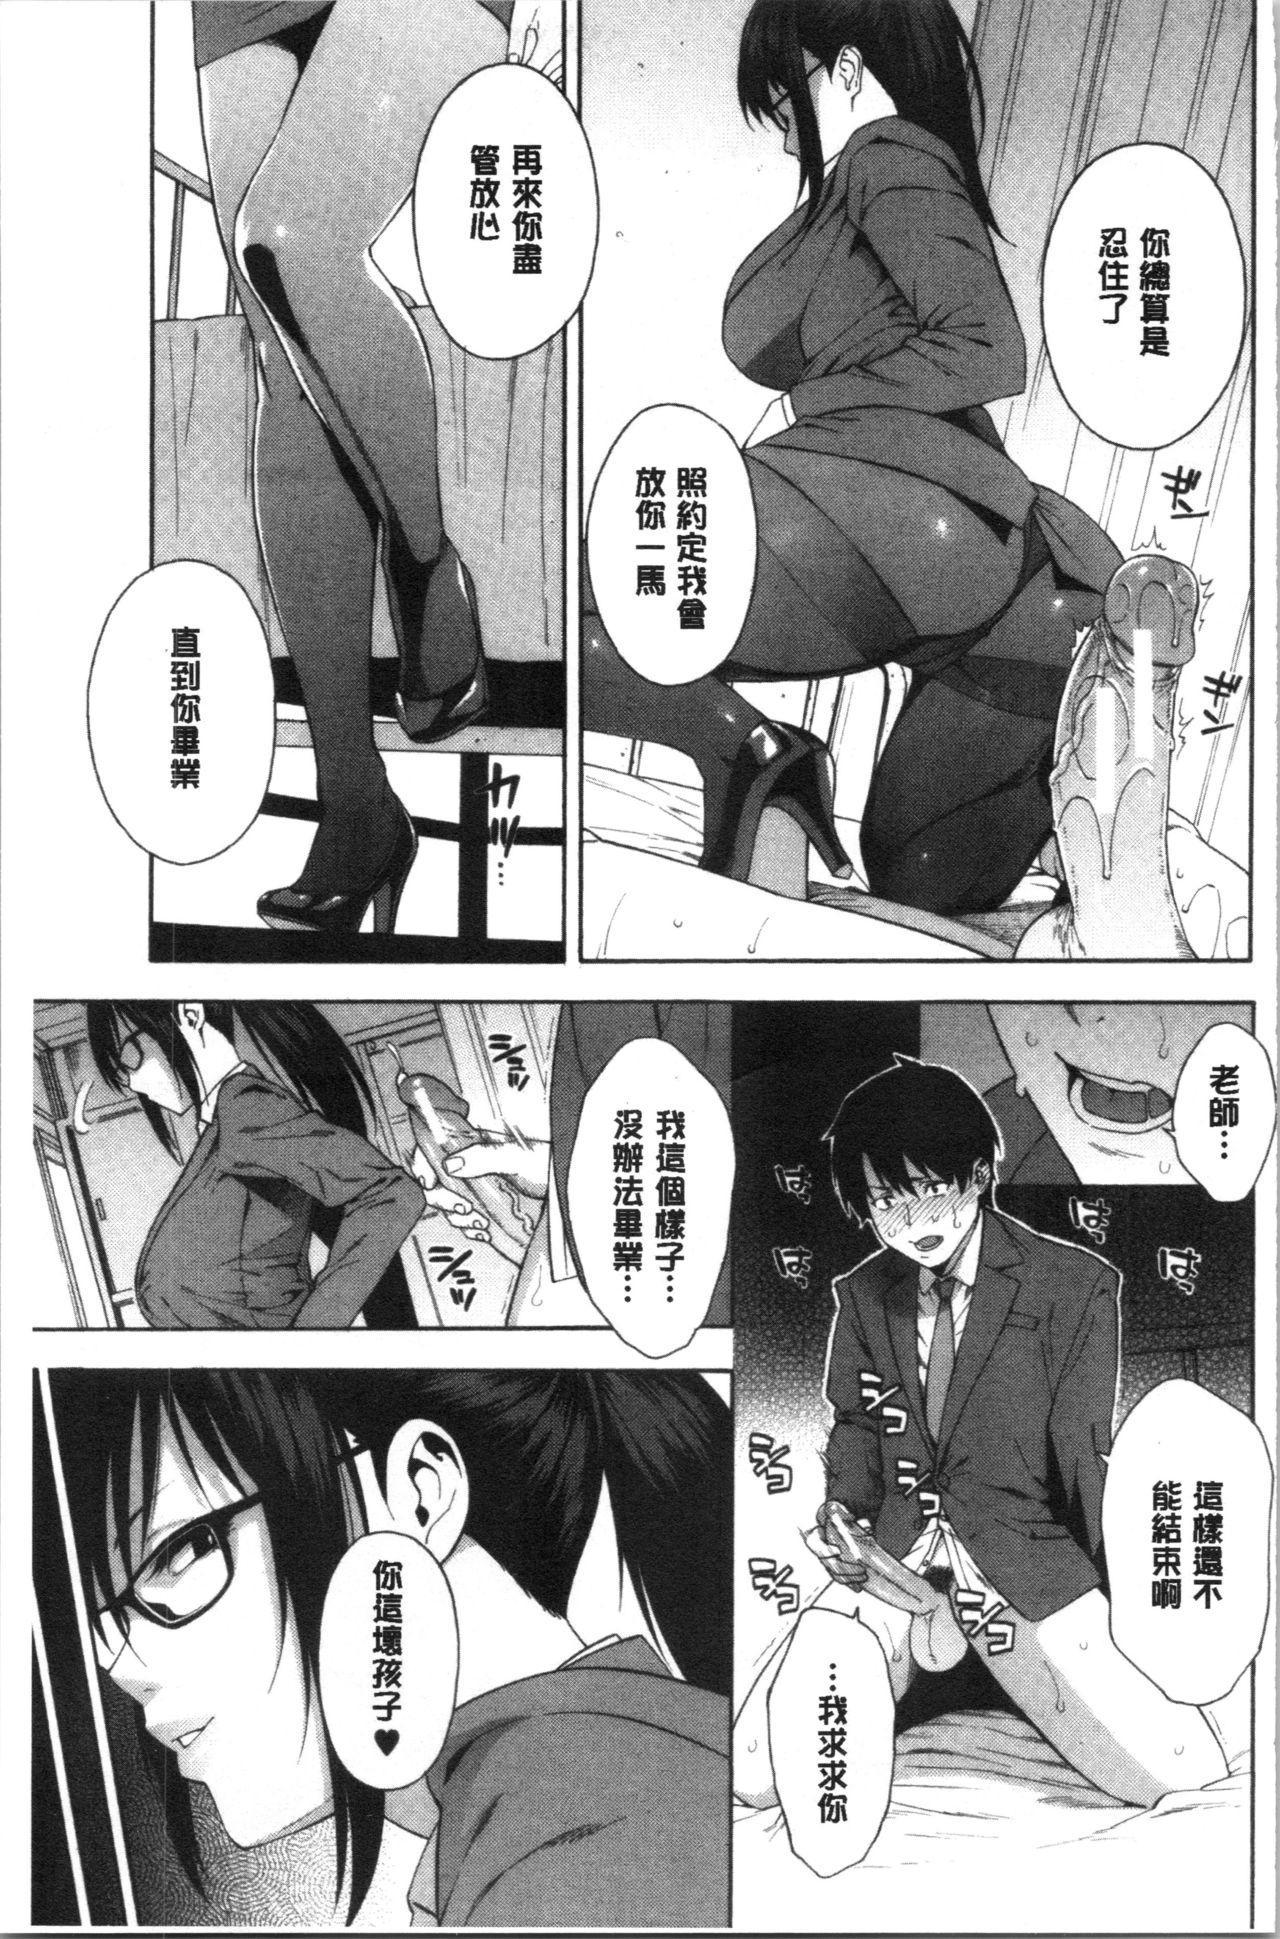 Okashite Ageru | 讓你來侵犯我 69